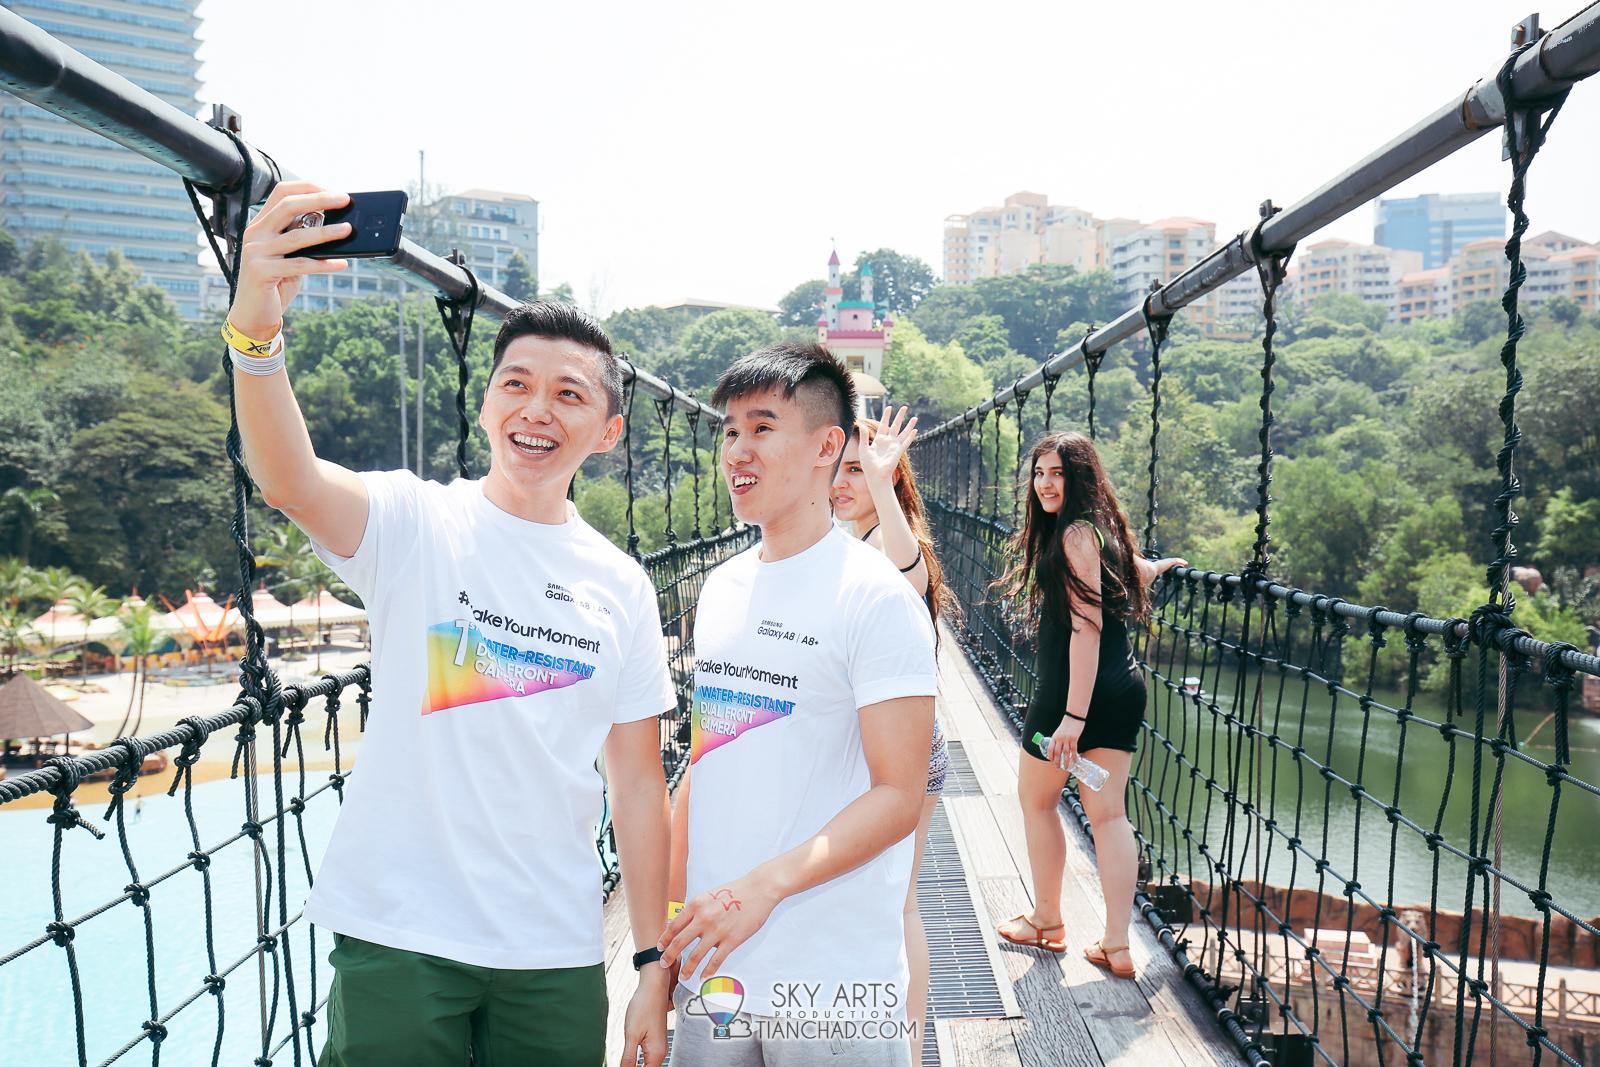 jaebum et Seung Ah datant